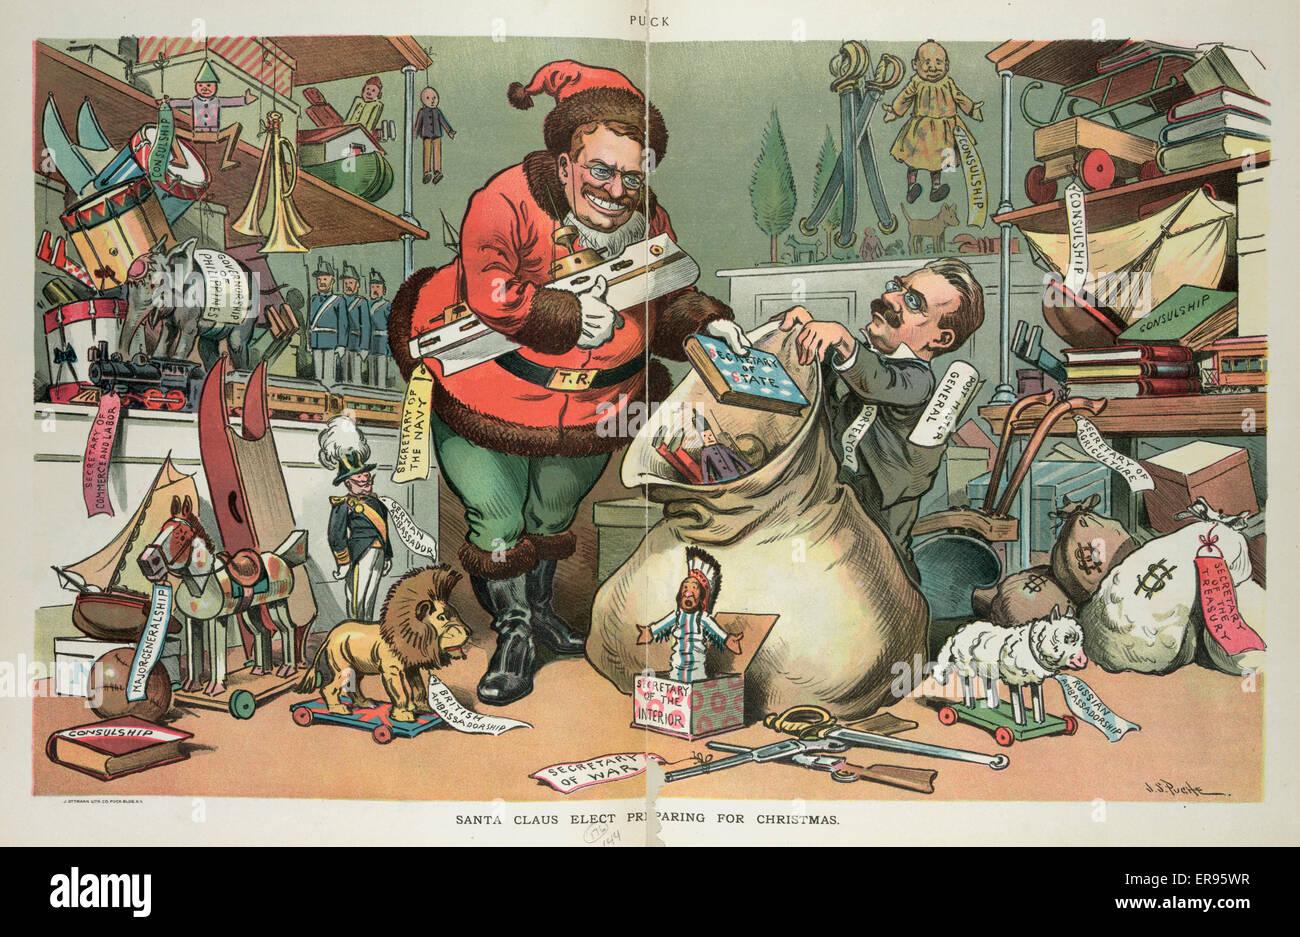 Santa Claus elect preparing for Christmas. Illustration shows Stock ...